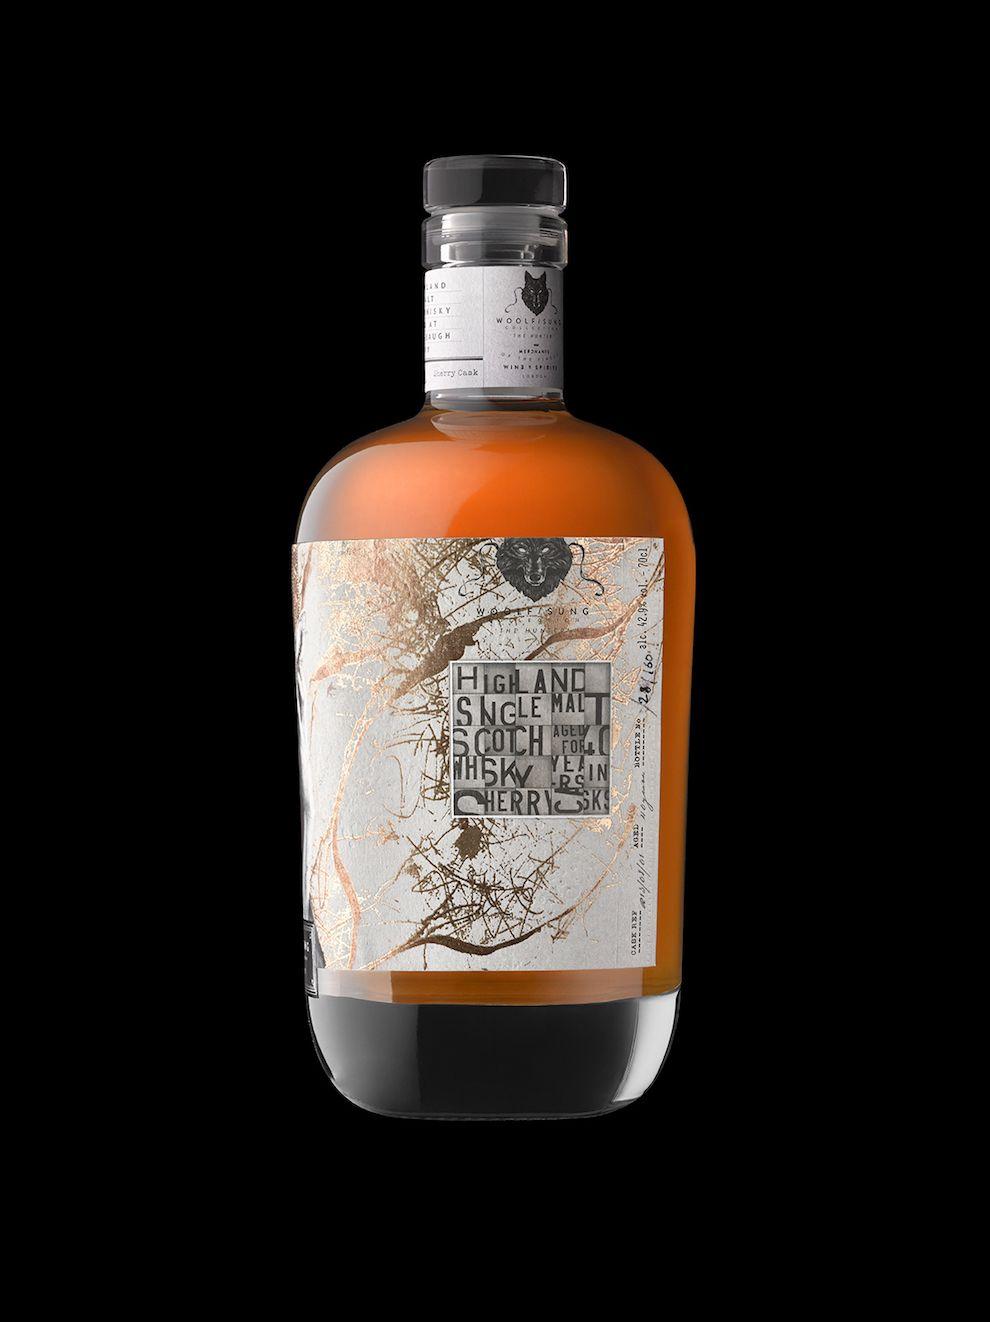 Woolf Sung Scotch Whisky Label Design